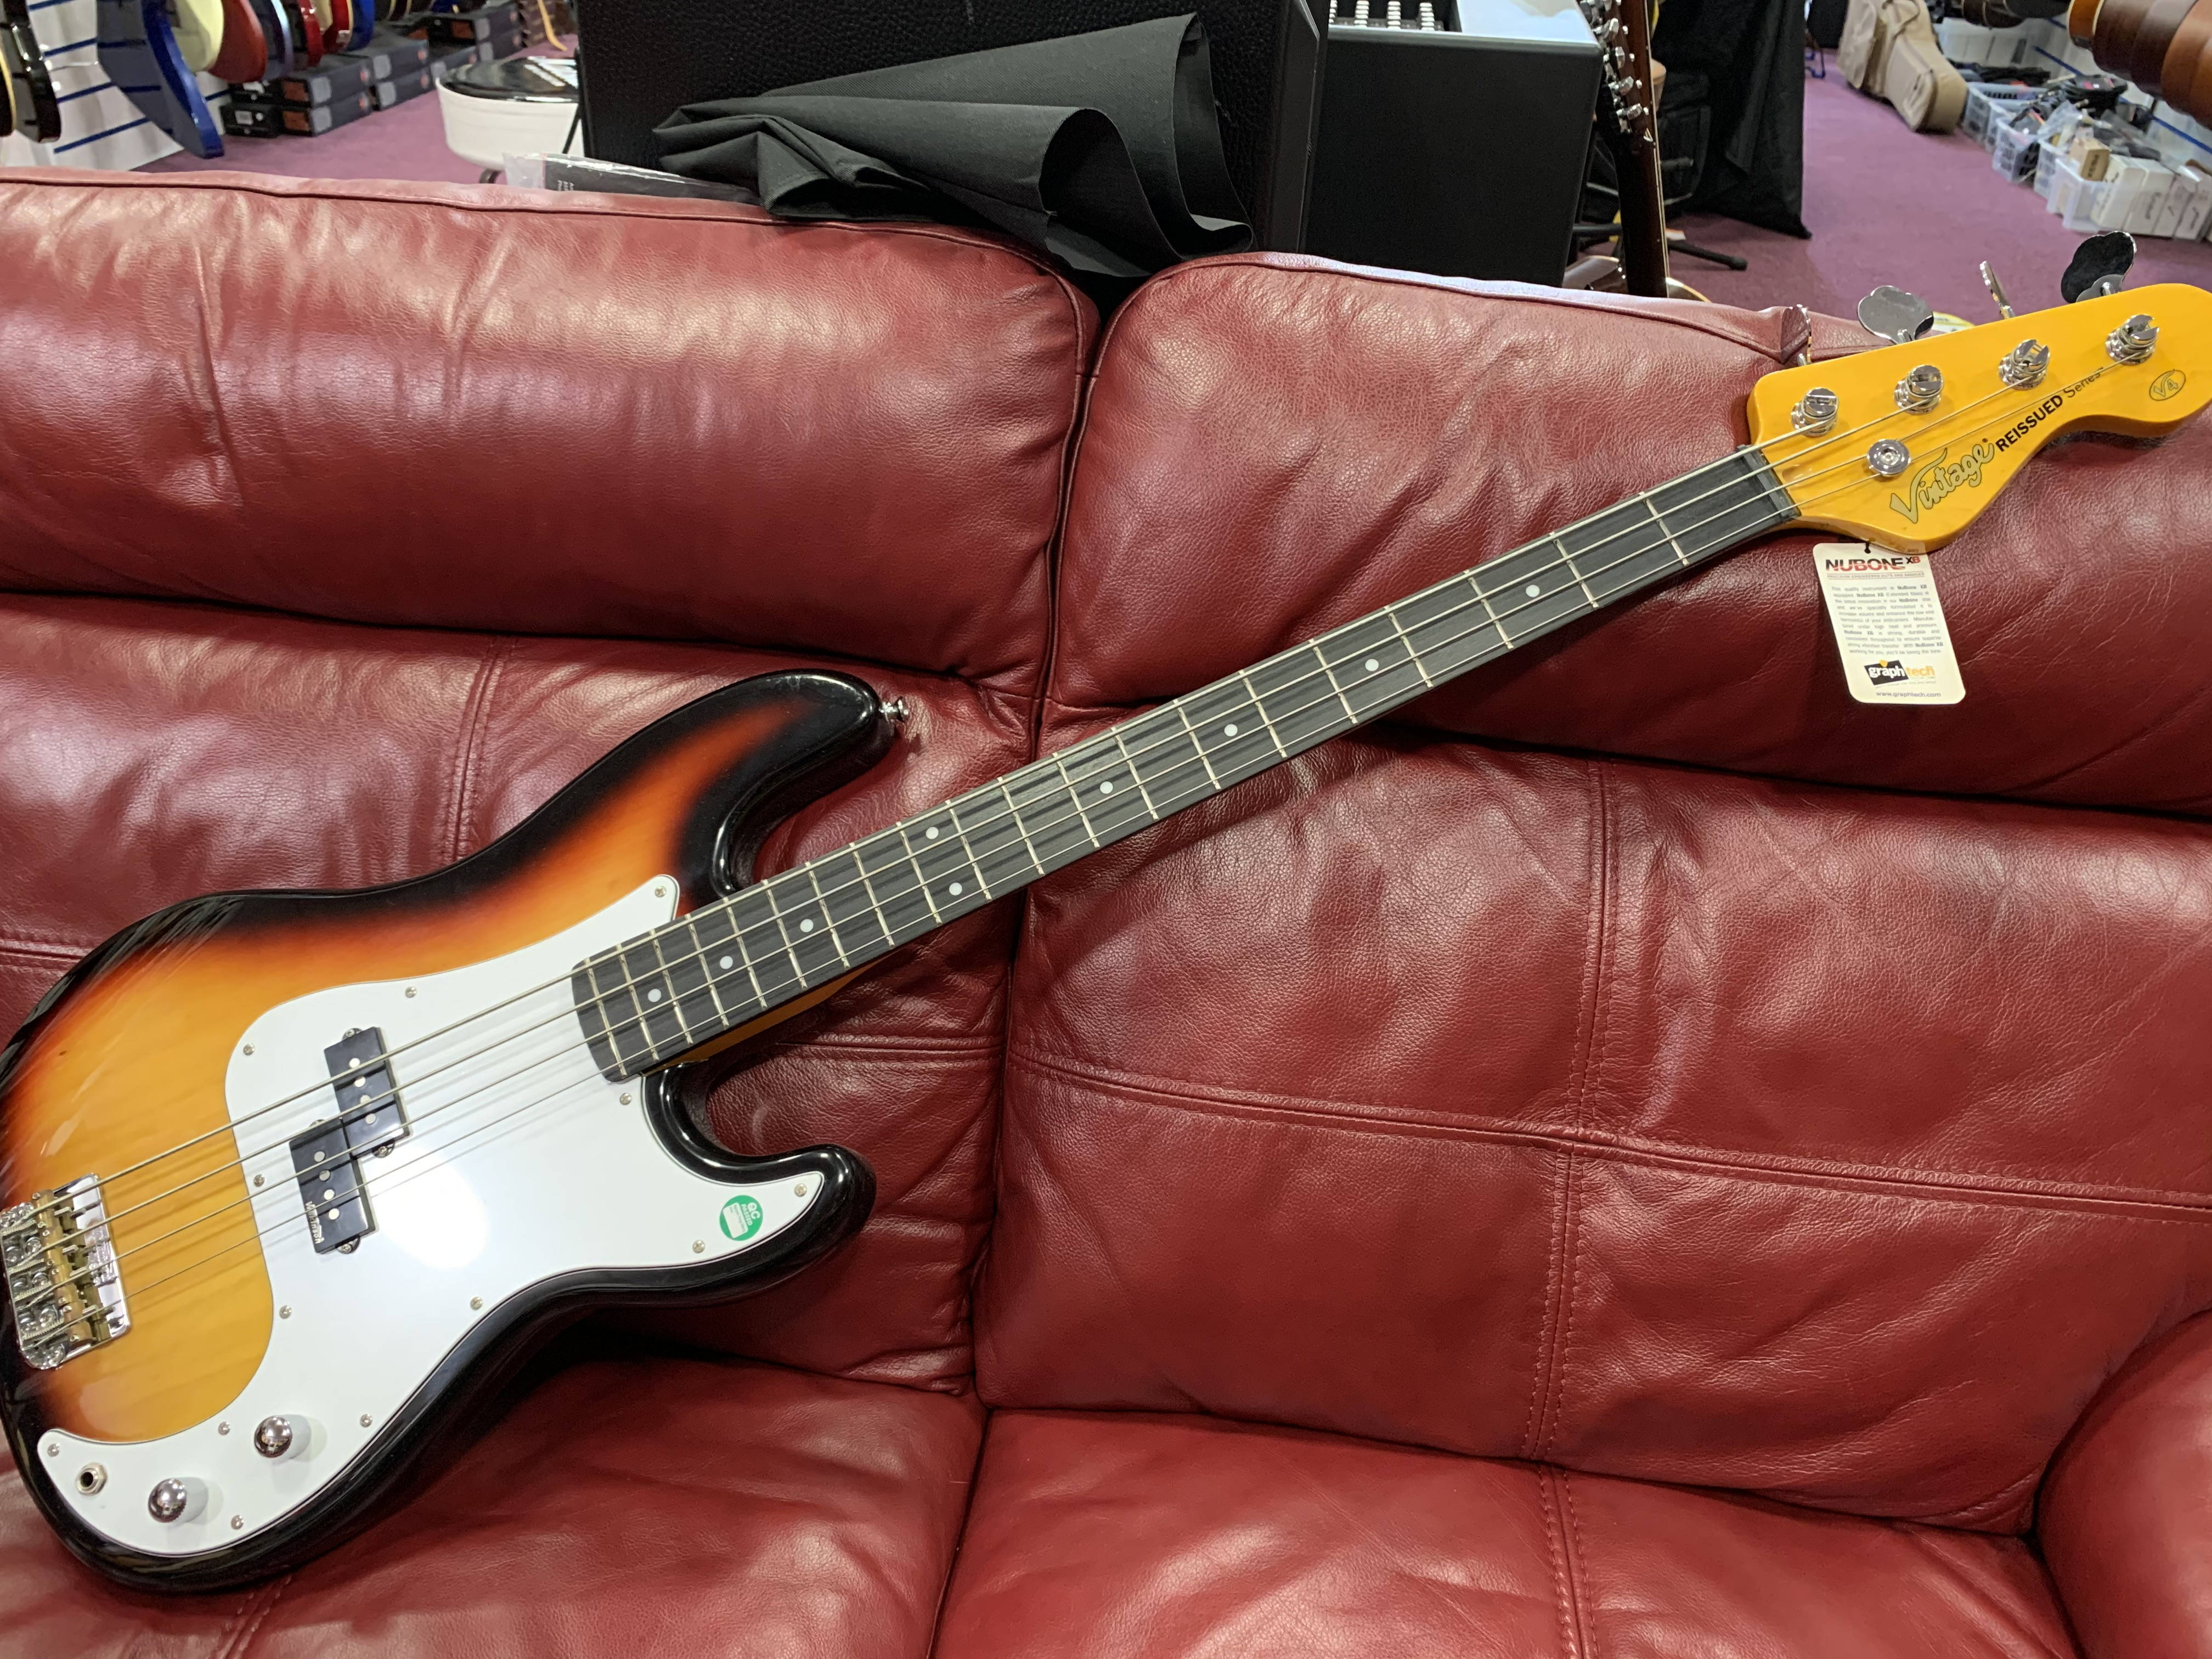 Vintage Reissued V4 Bass Guitar (Sunburst)